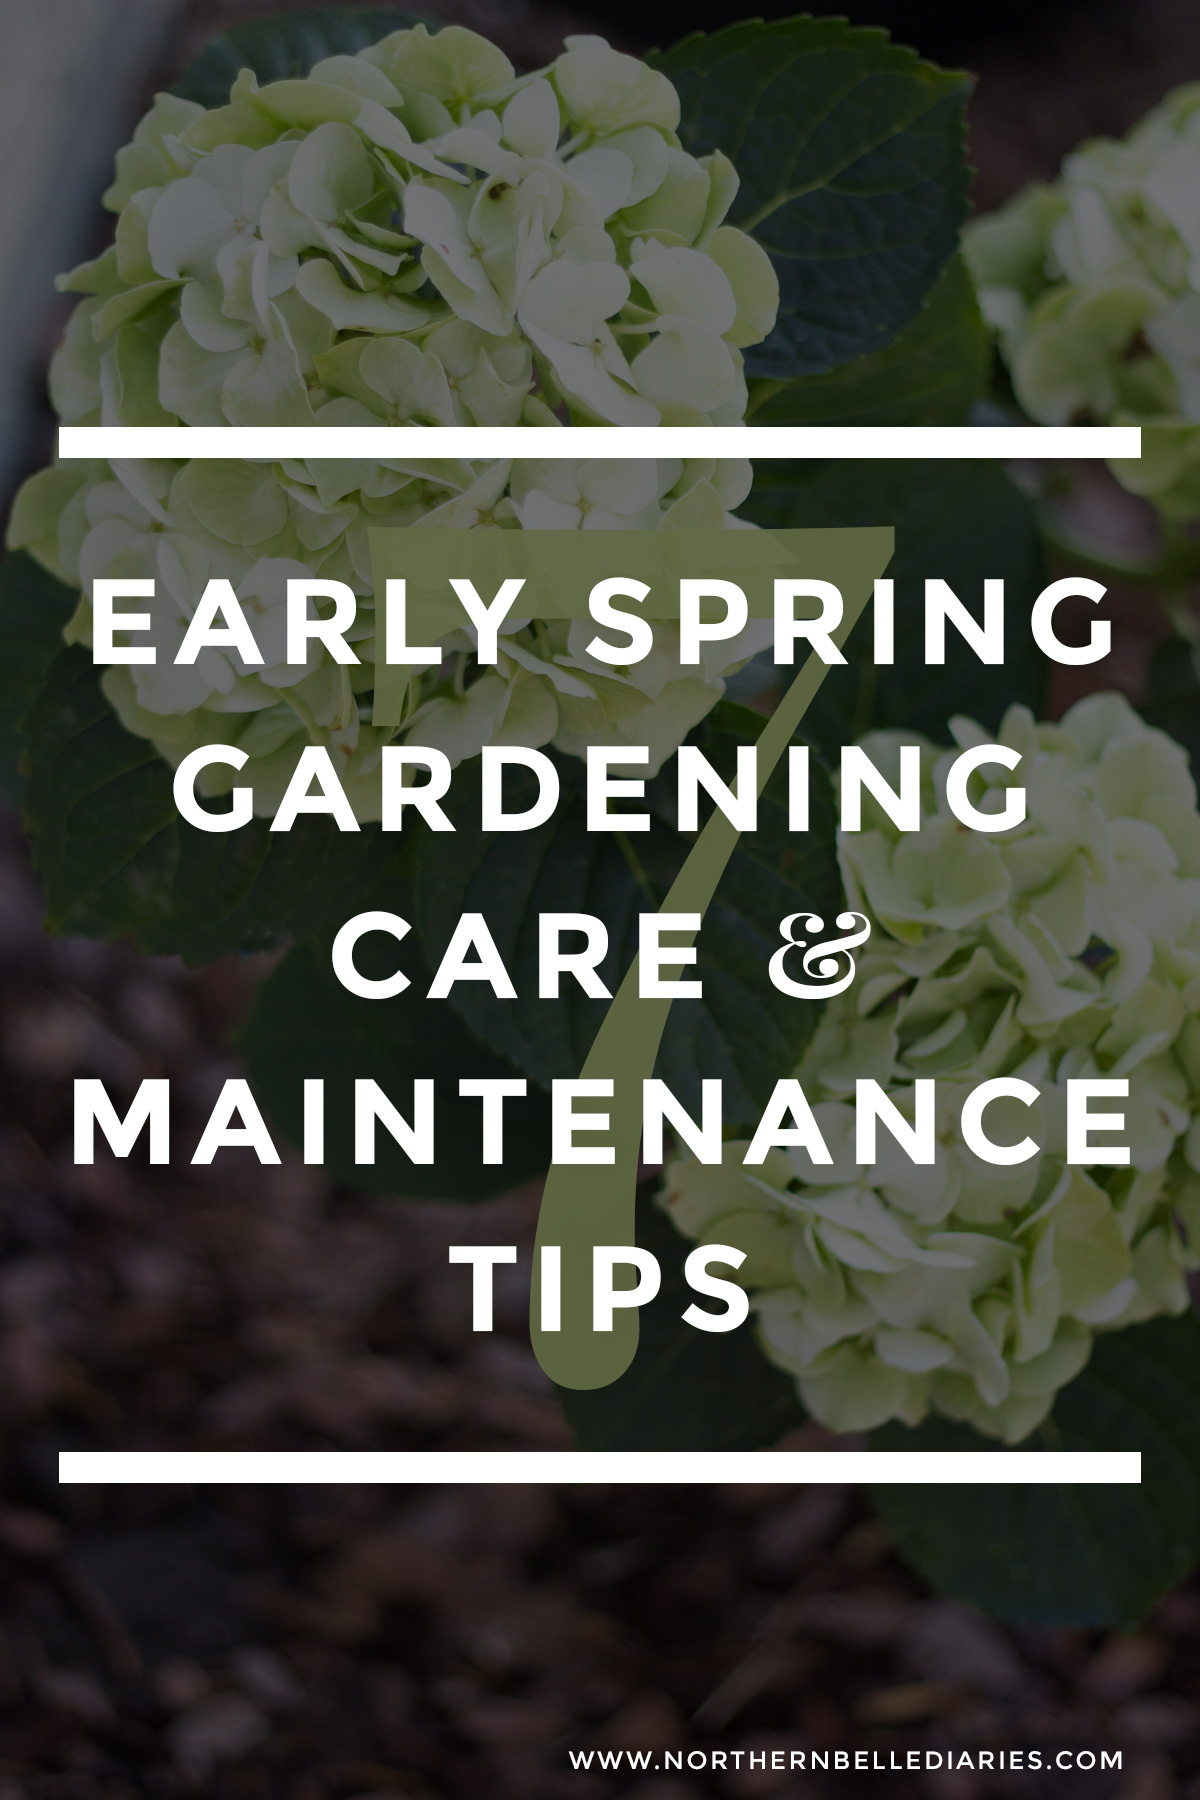 7 Early Spring Gardening Care & Maintenance Tips #LoveYourLawn #garden #gardentips #ad